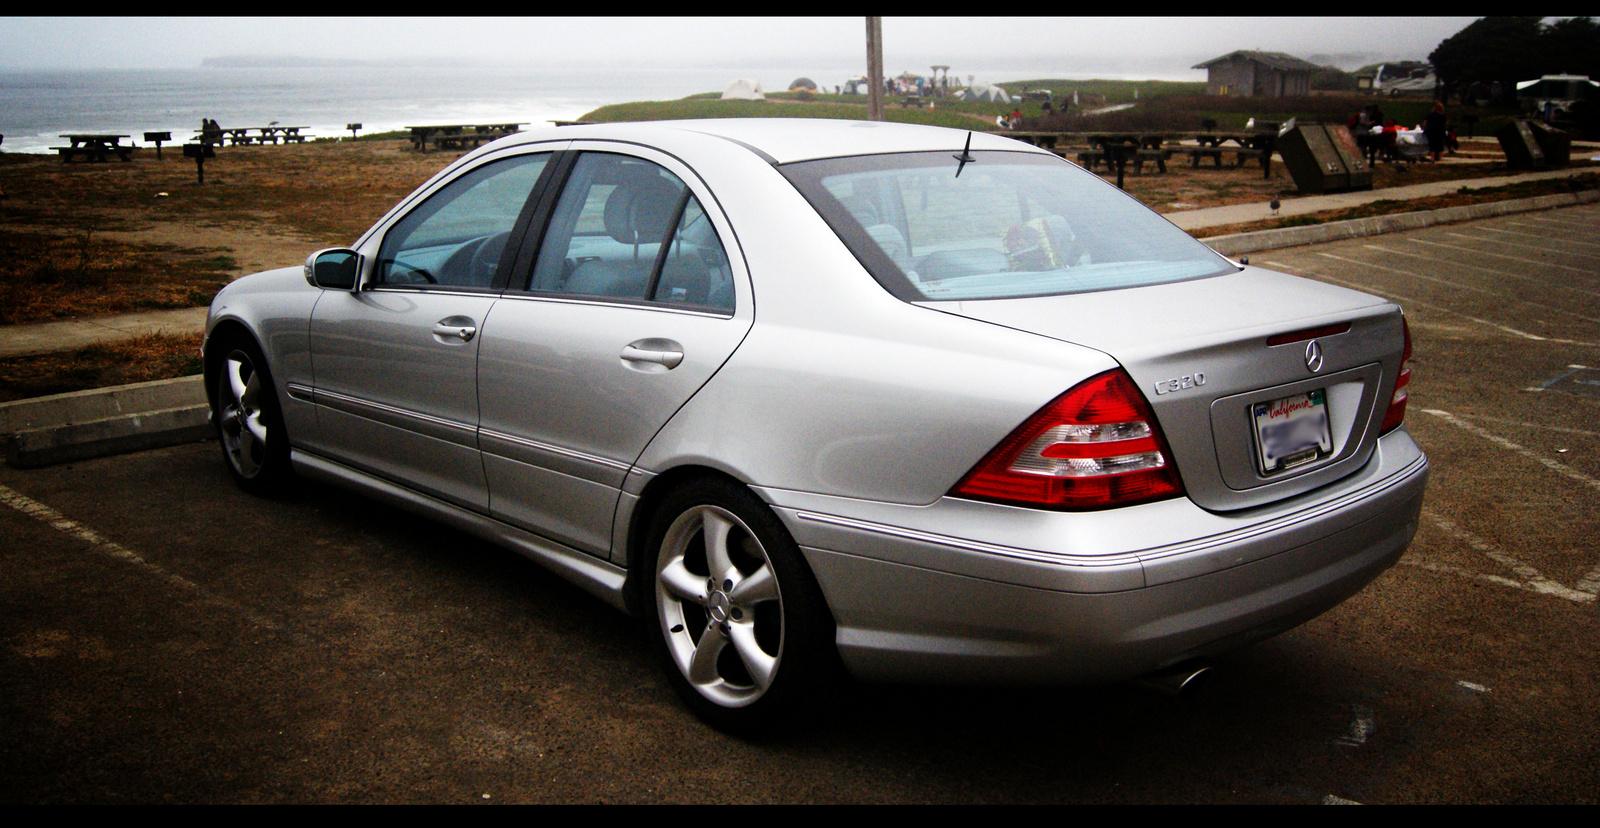 2005 Mercedes-benz C-class - Exterior Pictures